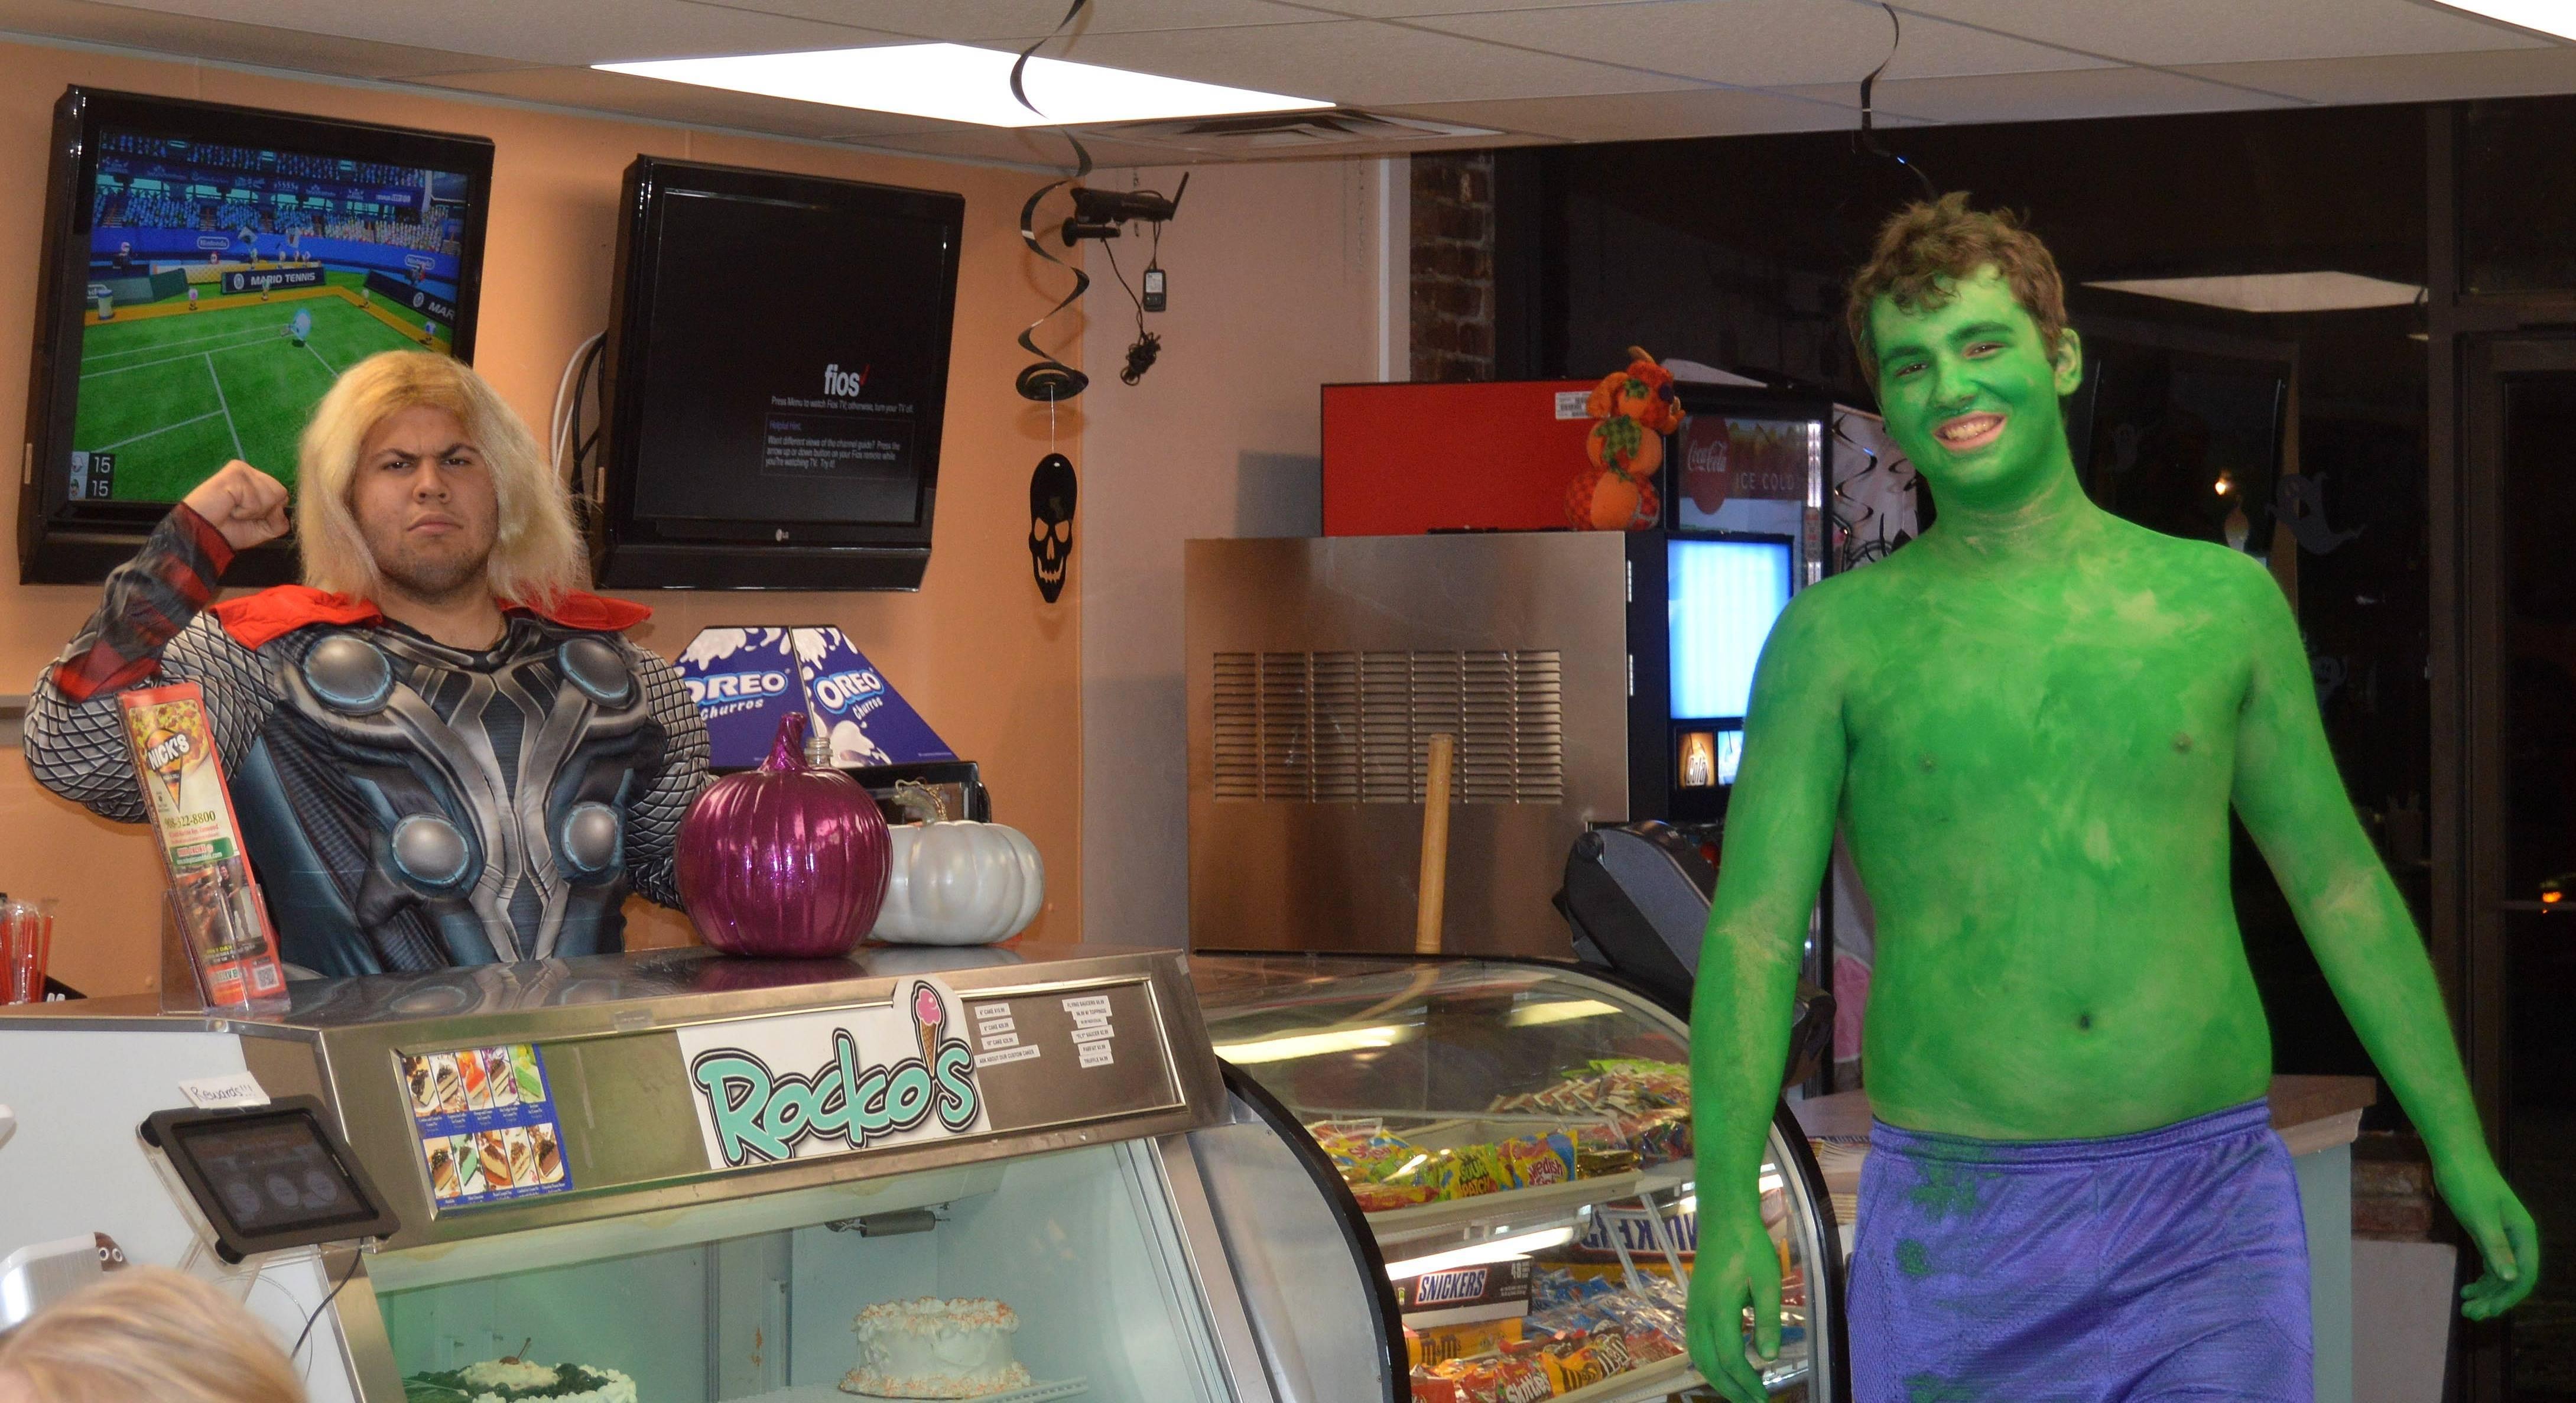 73e057bef63f7863873b_Nicks_-_Thor_and_Hulk.JPG